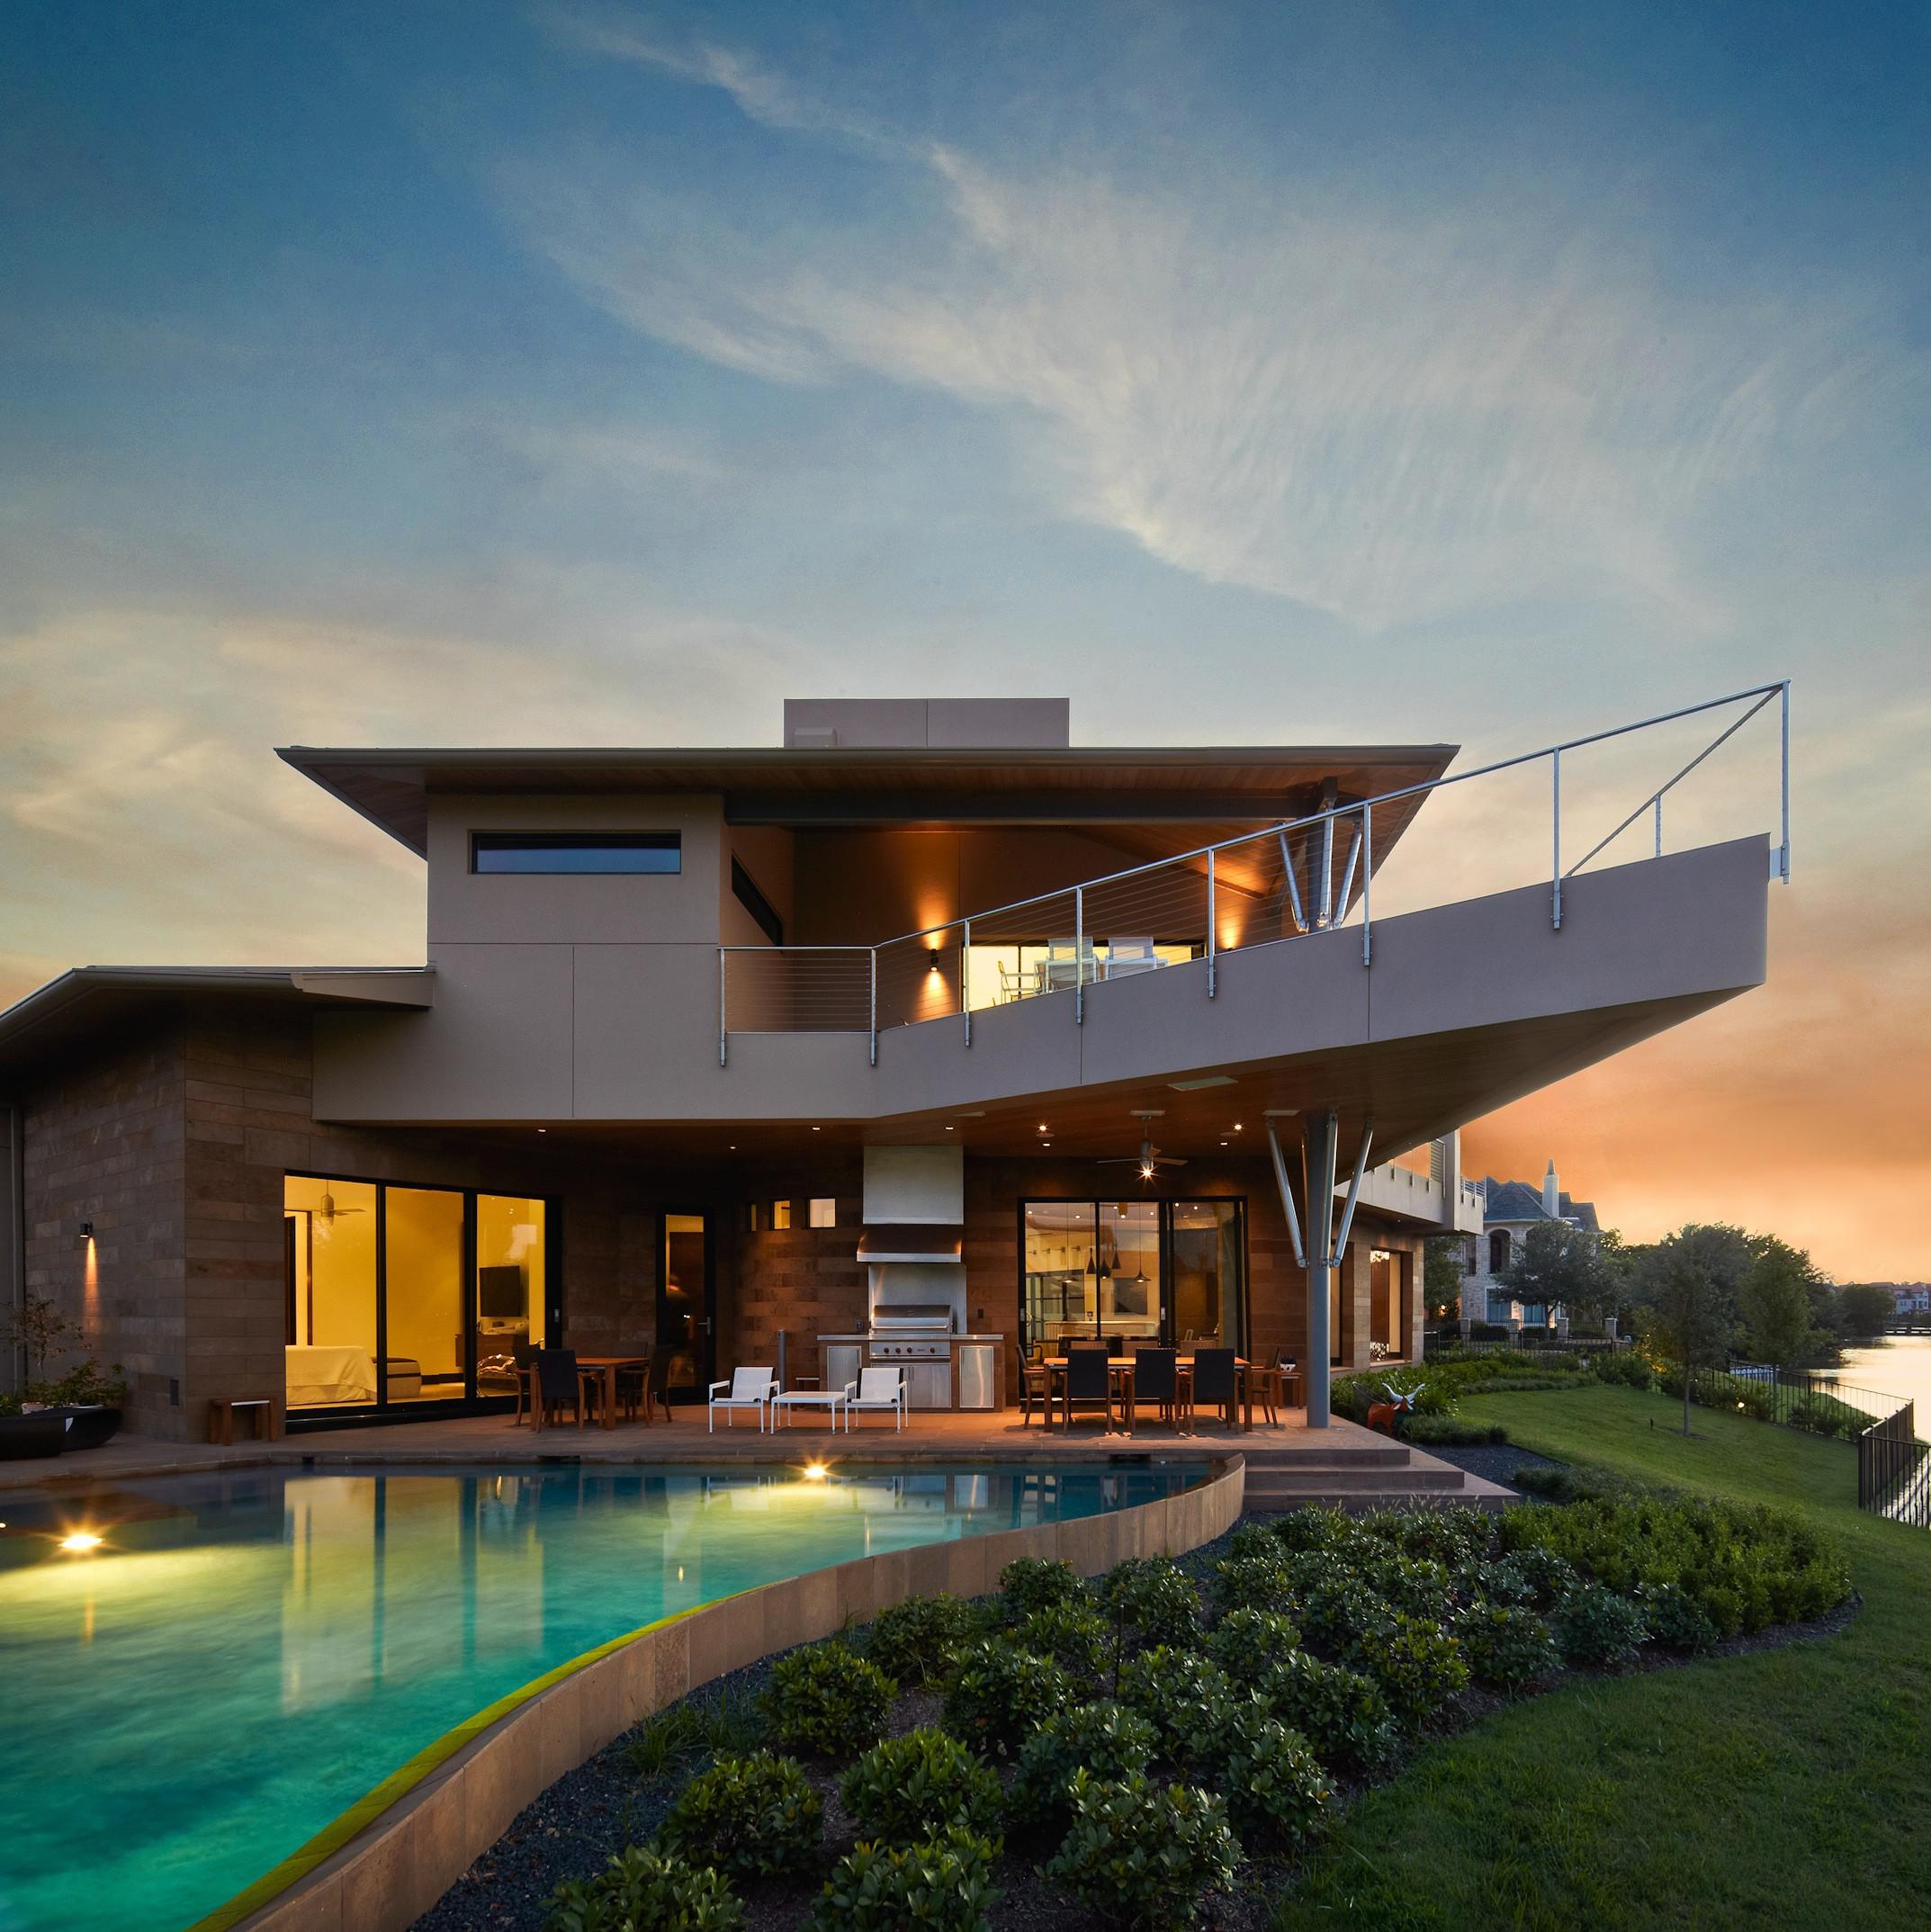 03. Modern Lakefront